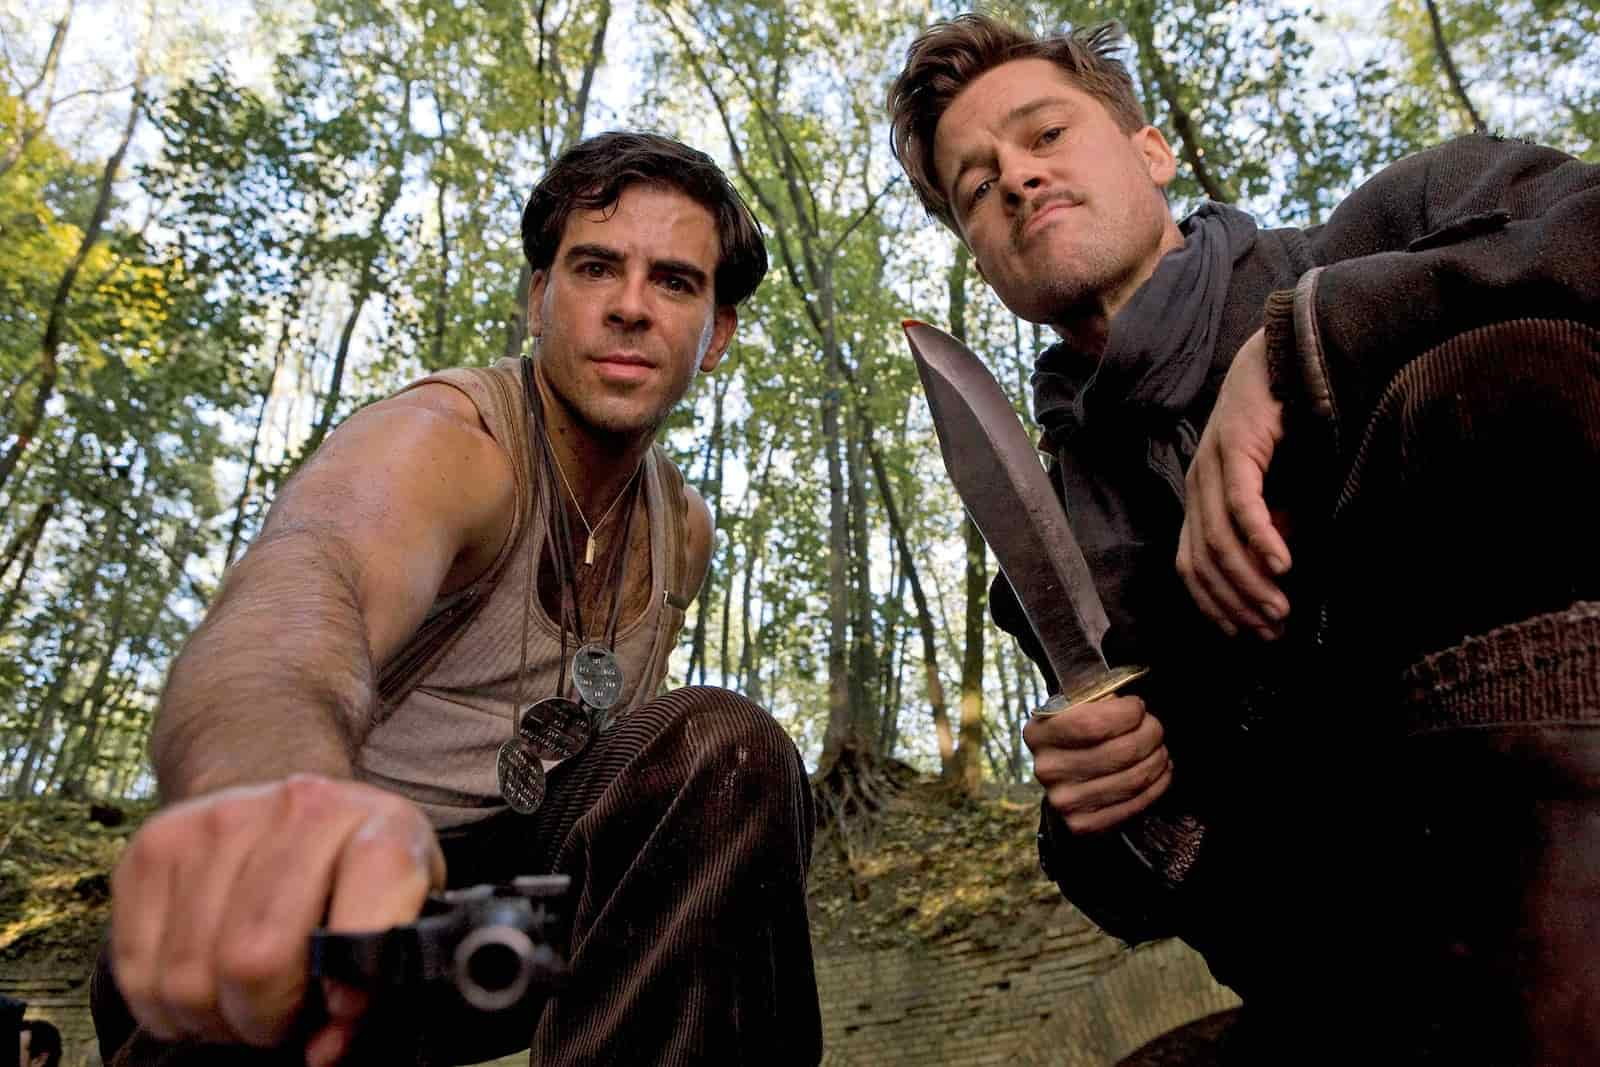 Quentin Tarantino Movies - Inglorious Bastards - POV Shot